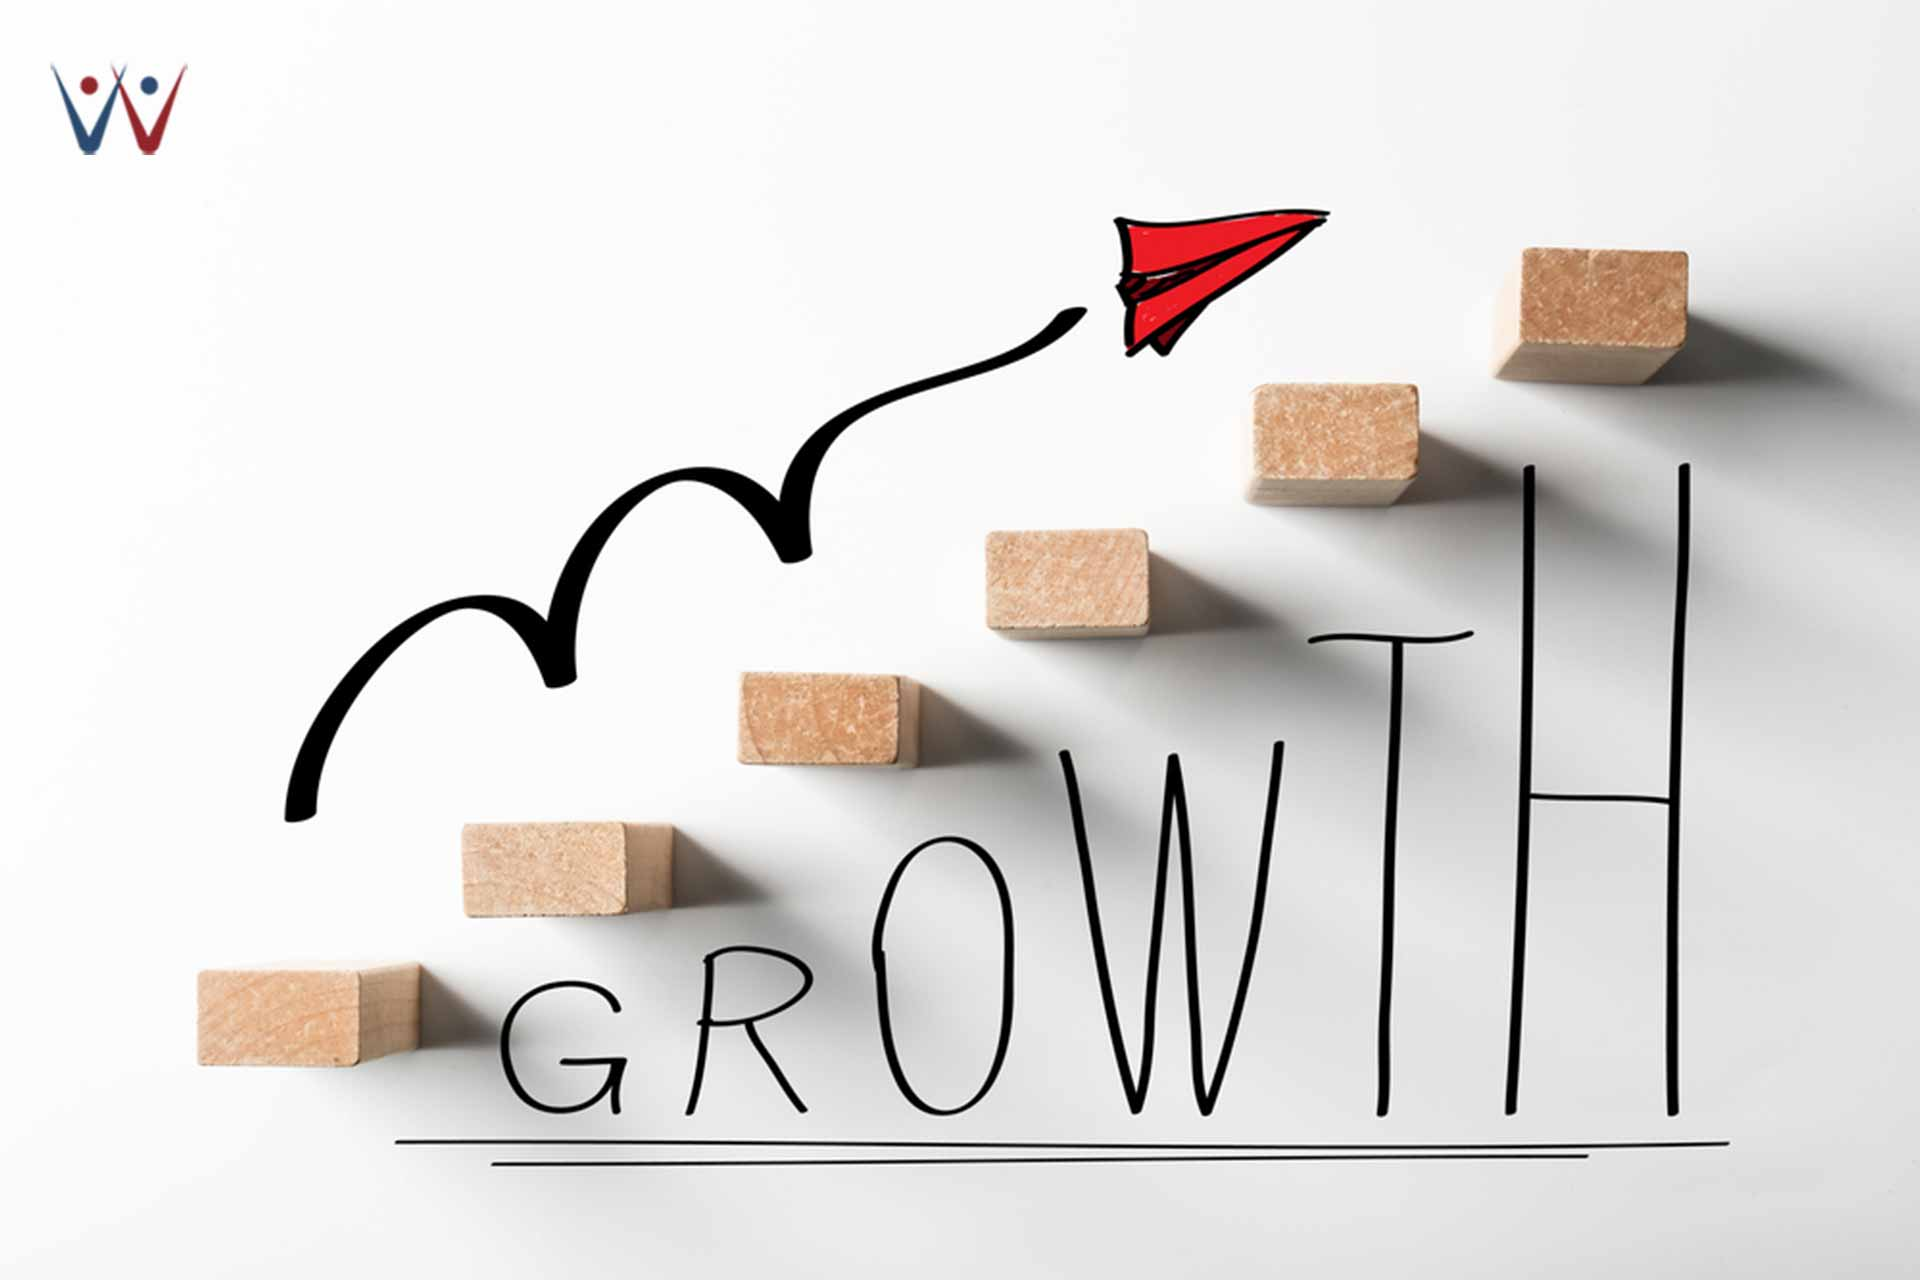 Dorongan Stimulus Bisnis bagi UKM dan UMKM